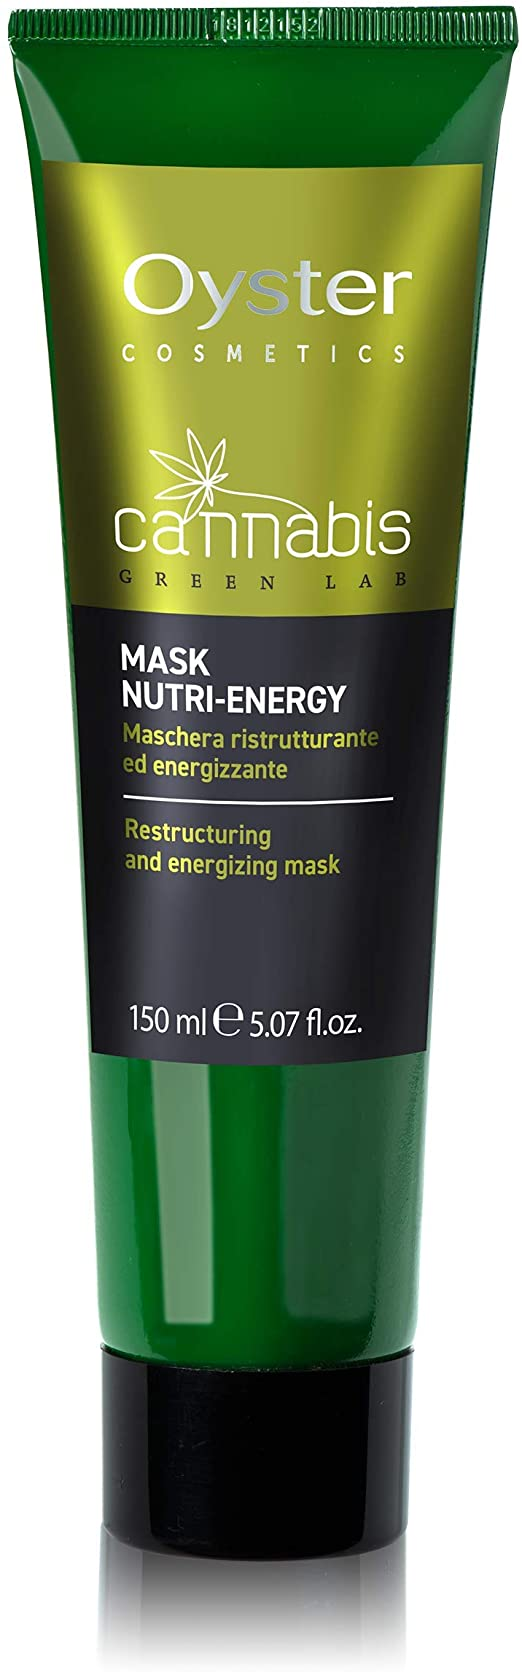 mascarilla-para-el-cabello-cannabis-nutri-energy-oyster-cosmetics